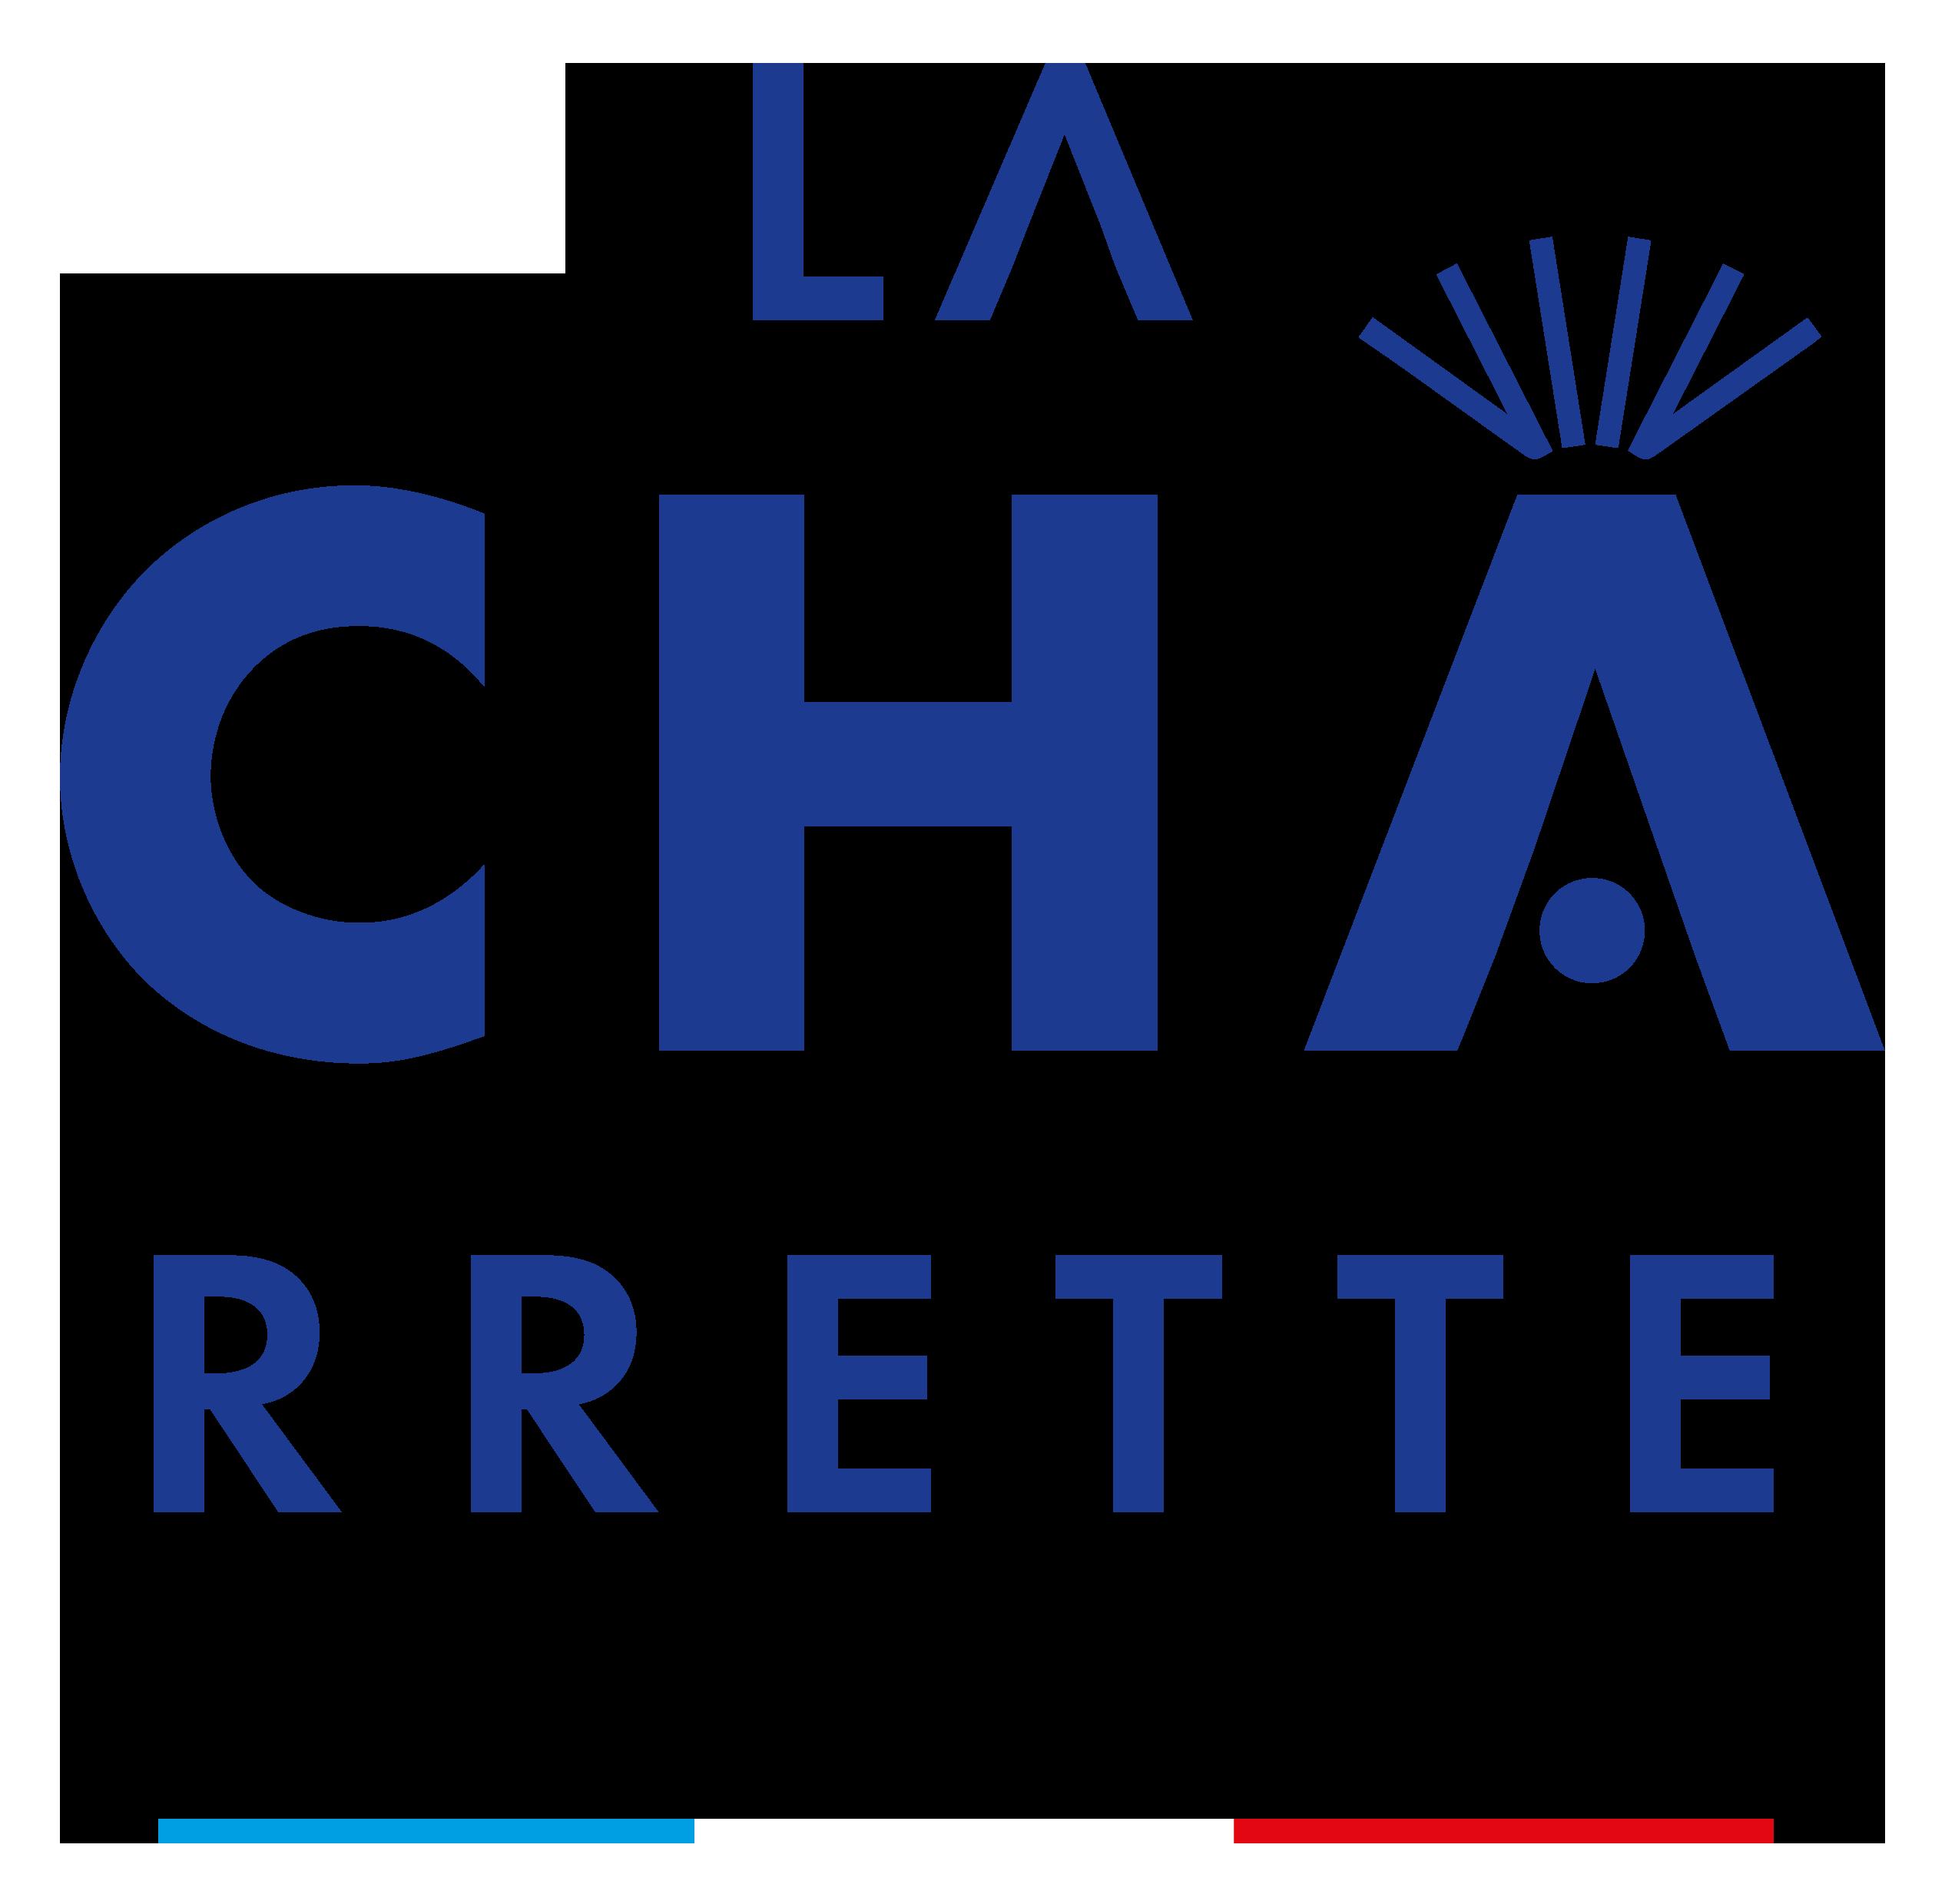 Les rencontres de La Charrette